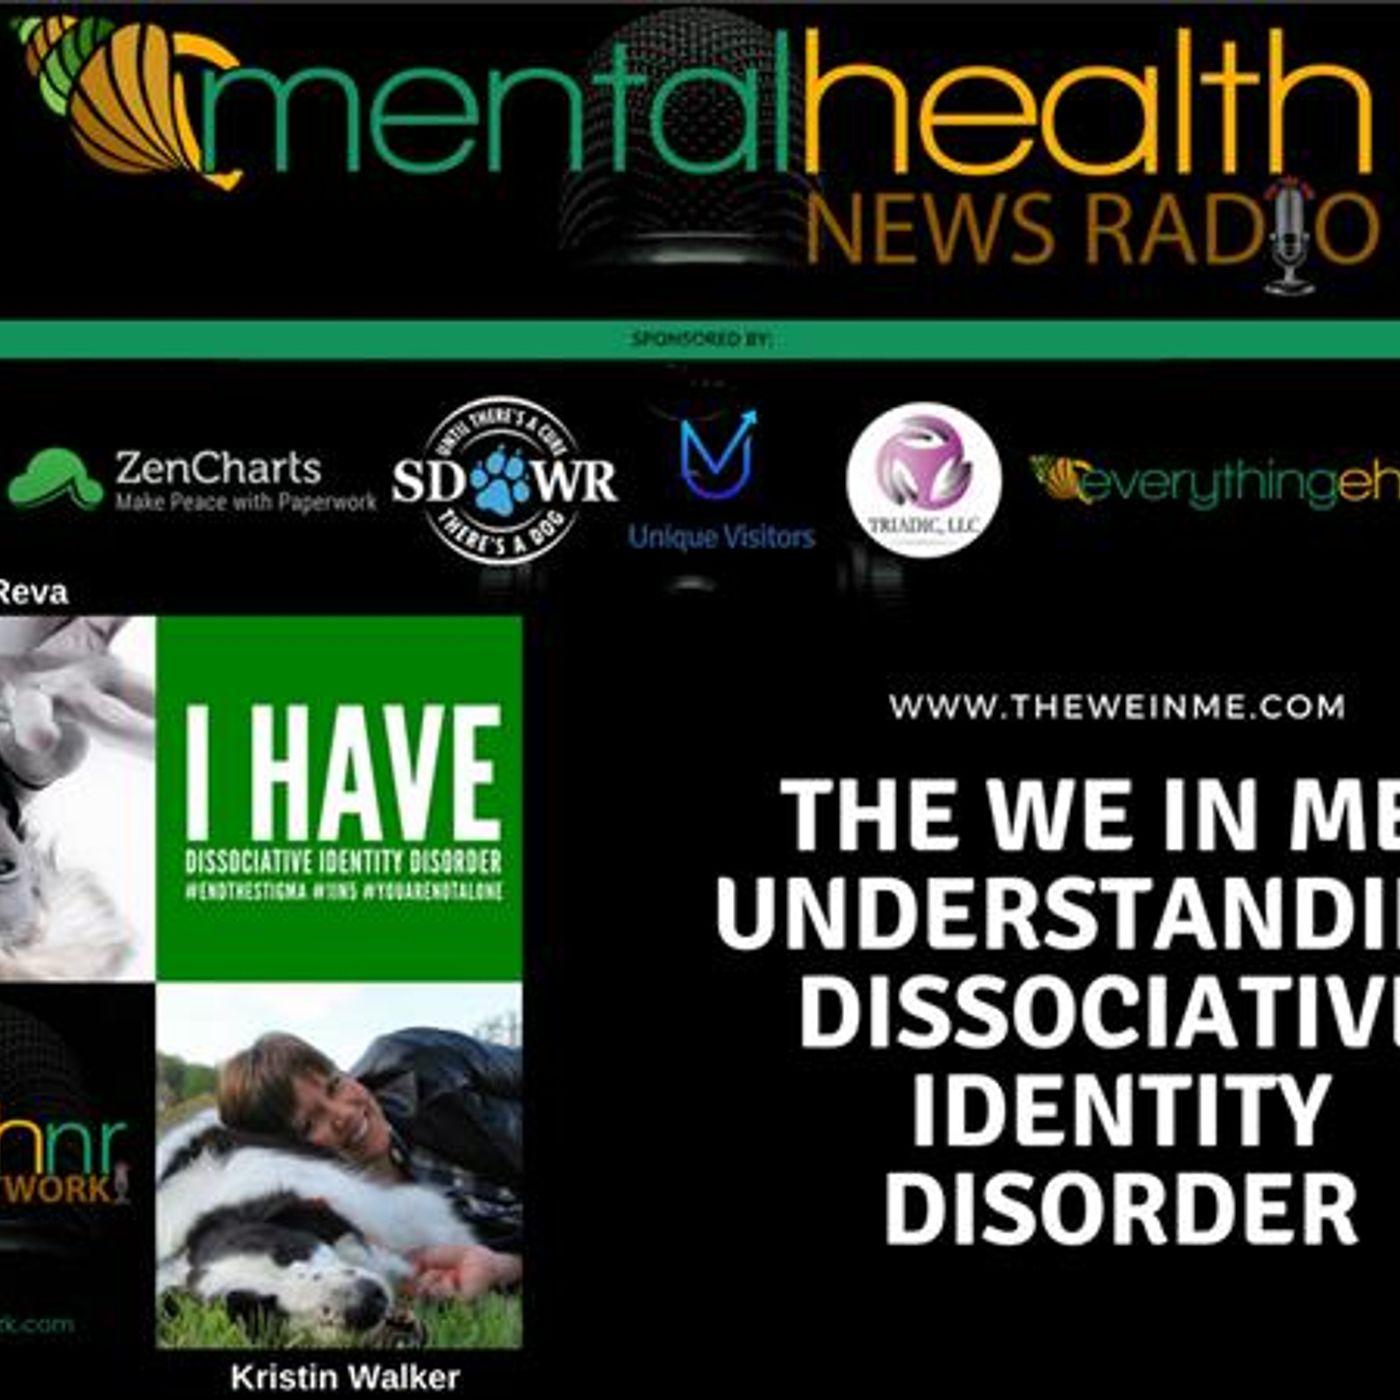 Mental Health News Radio - The We In Me: Understanding Dissociative Identity Disorder with Erika Reva